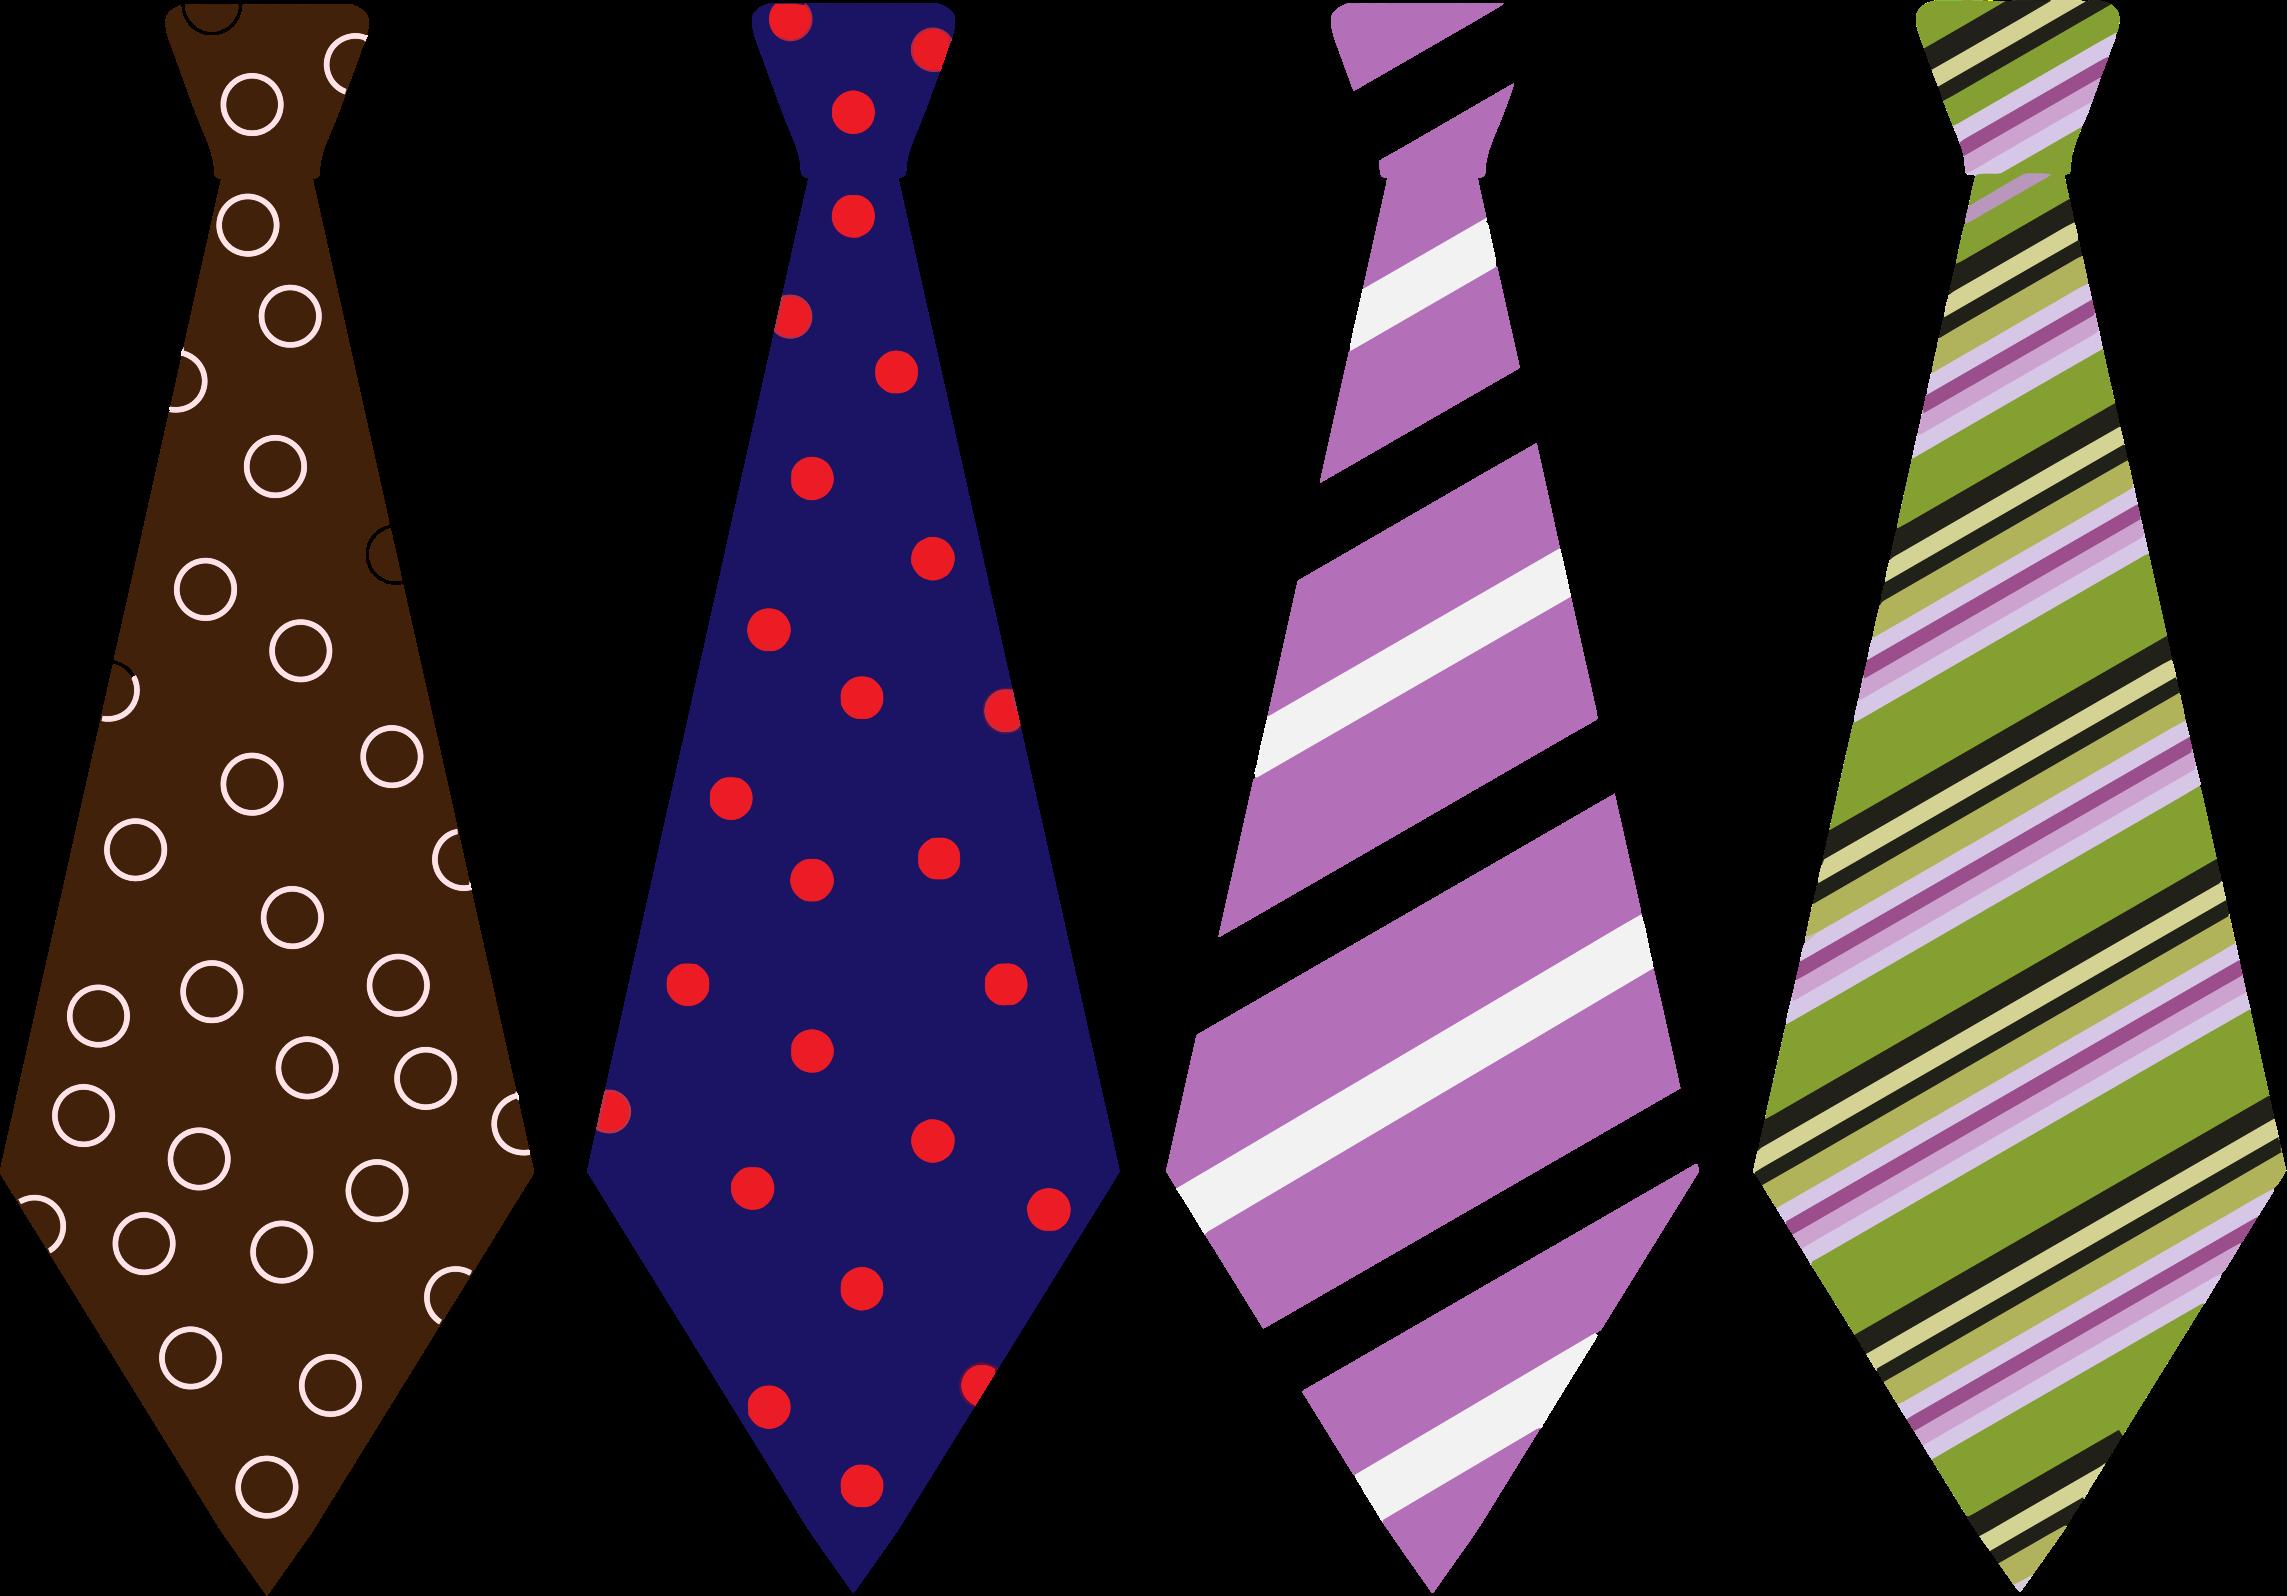 Clipart - Patterned Men's Ties